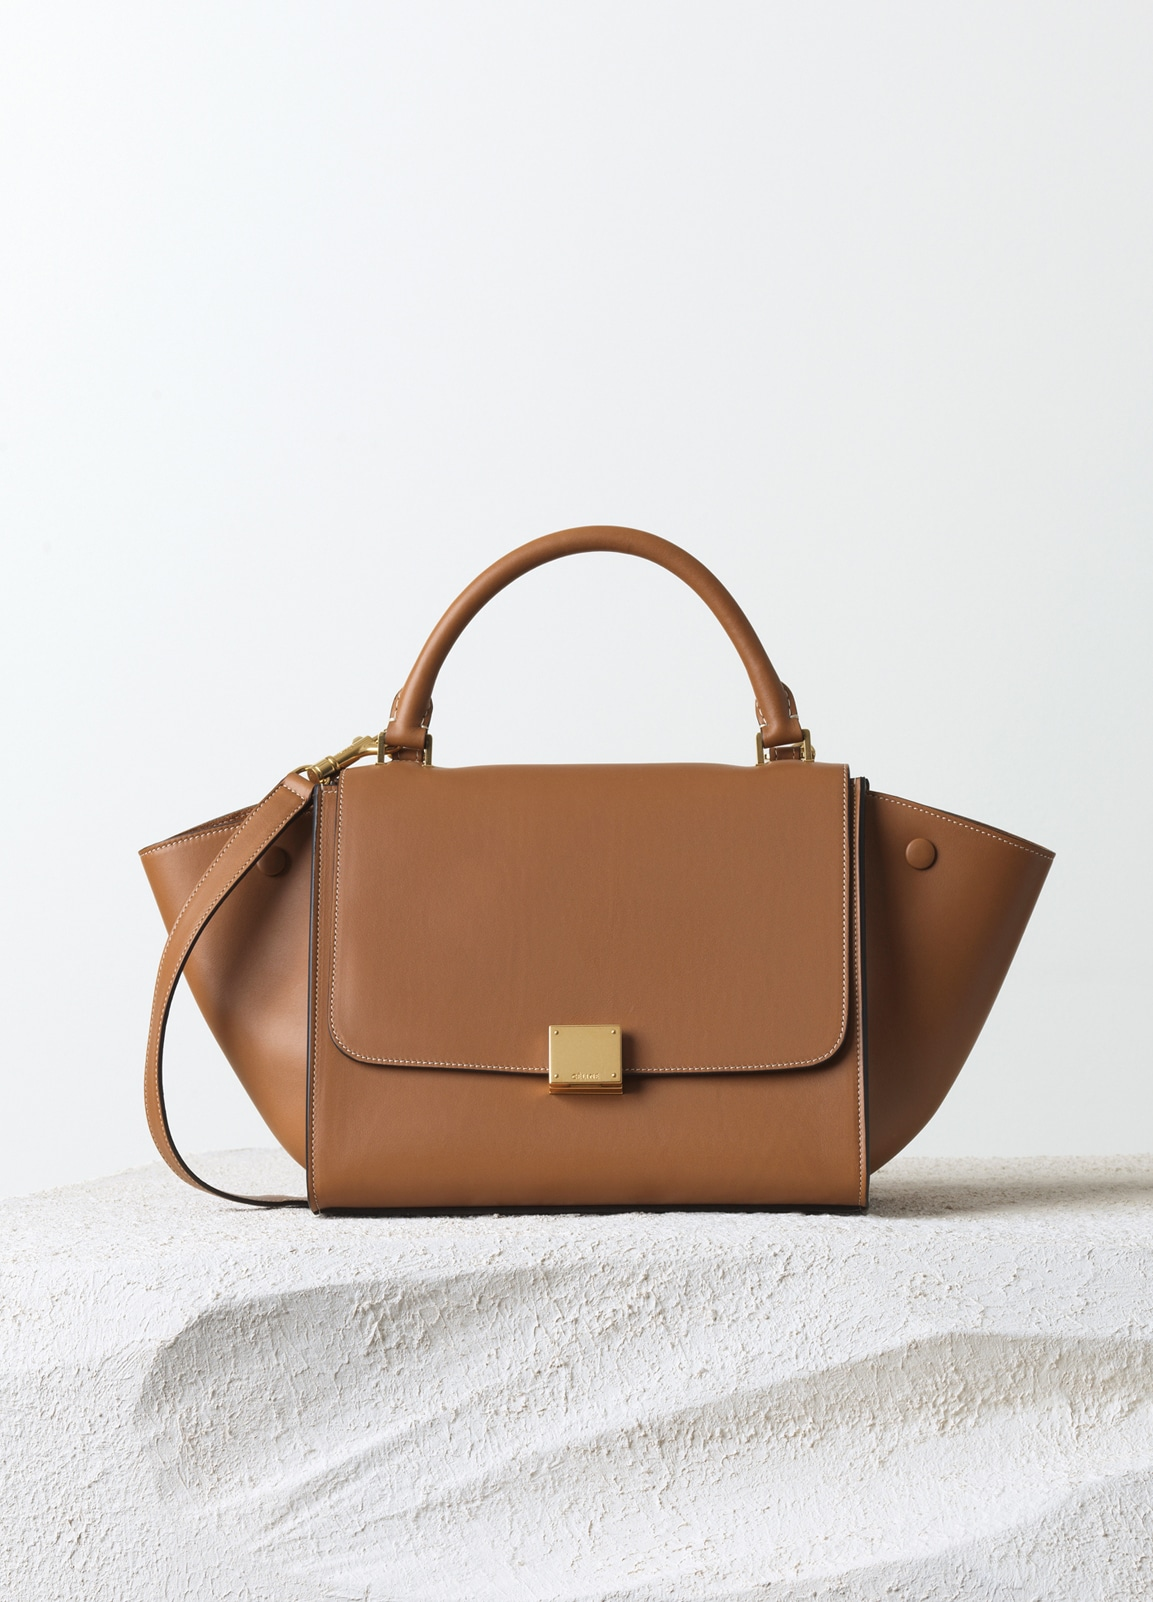 Celine Tan Natural Calfskin Tze Small Bag